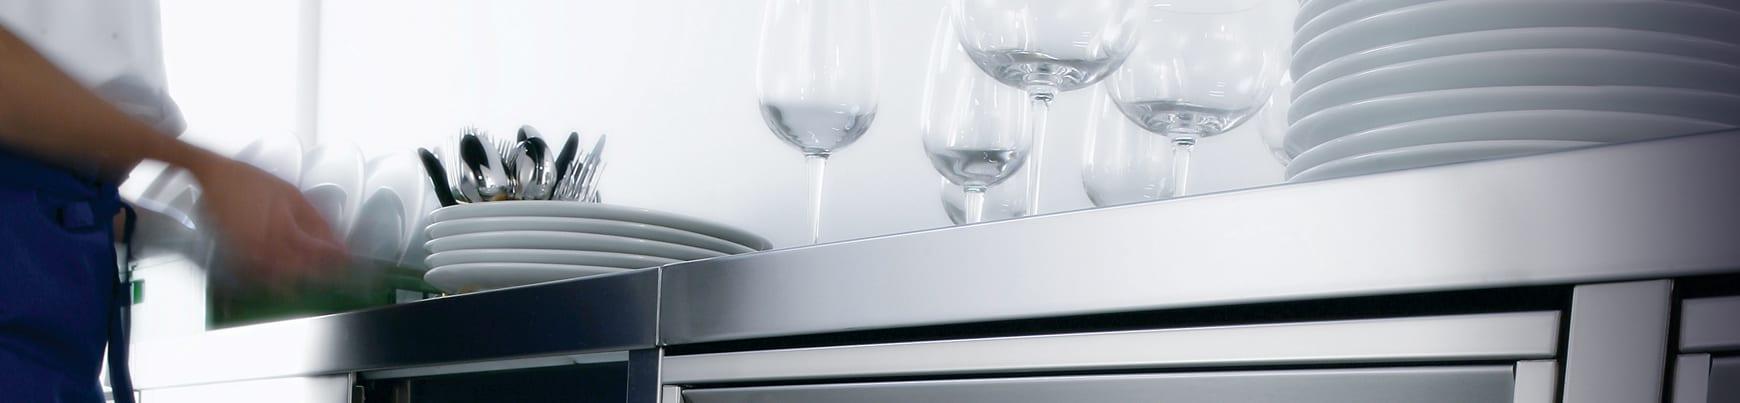 professionel opvaskemaskine